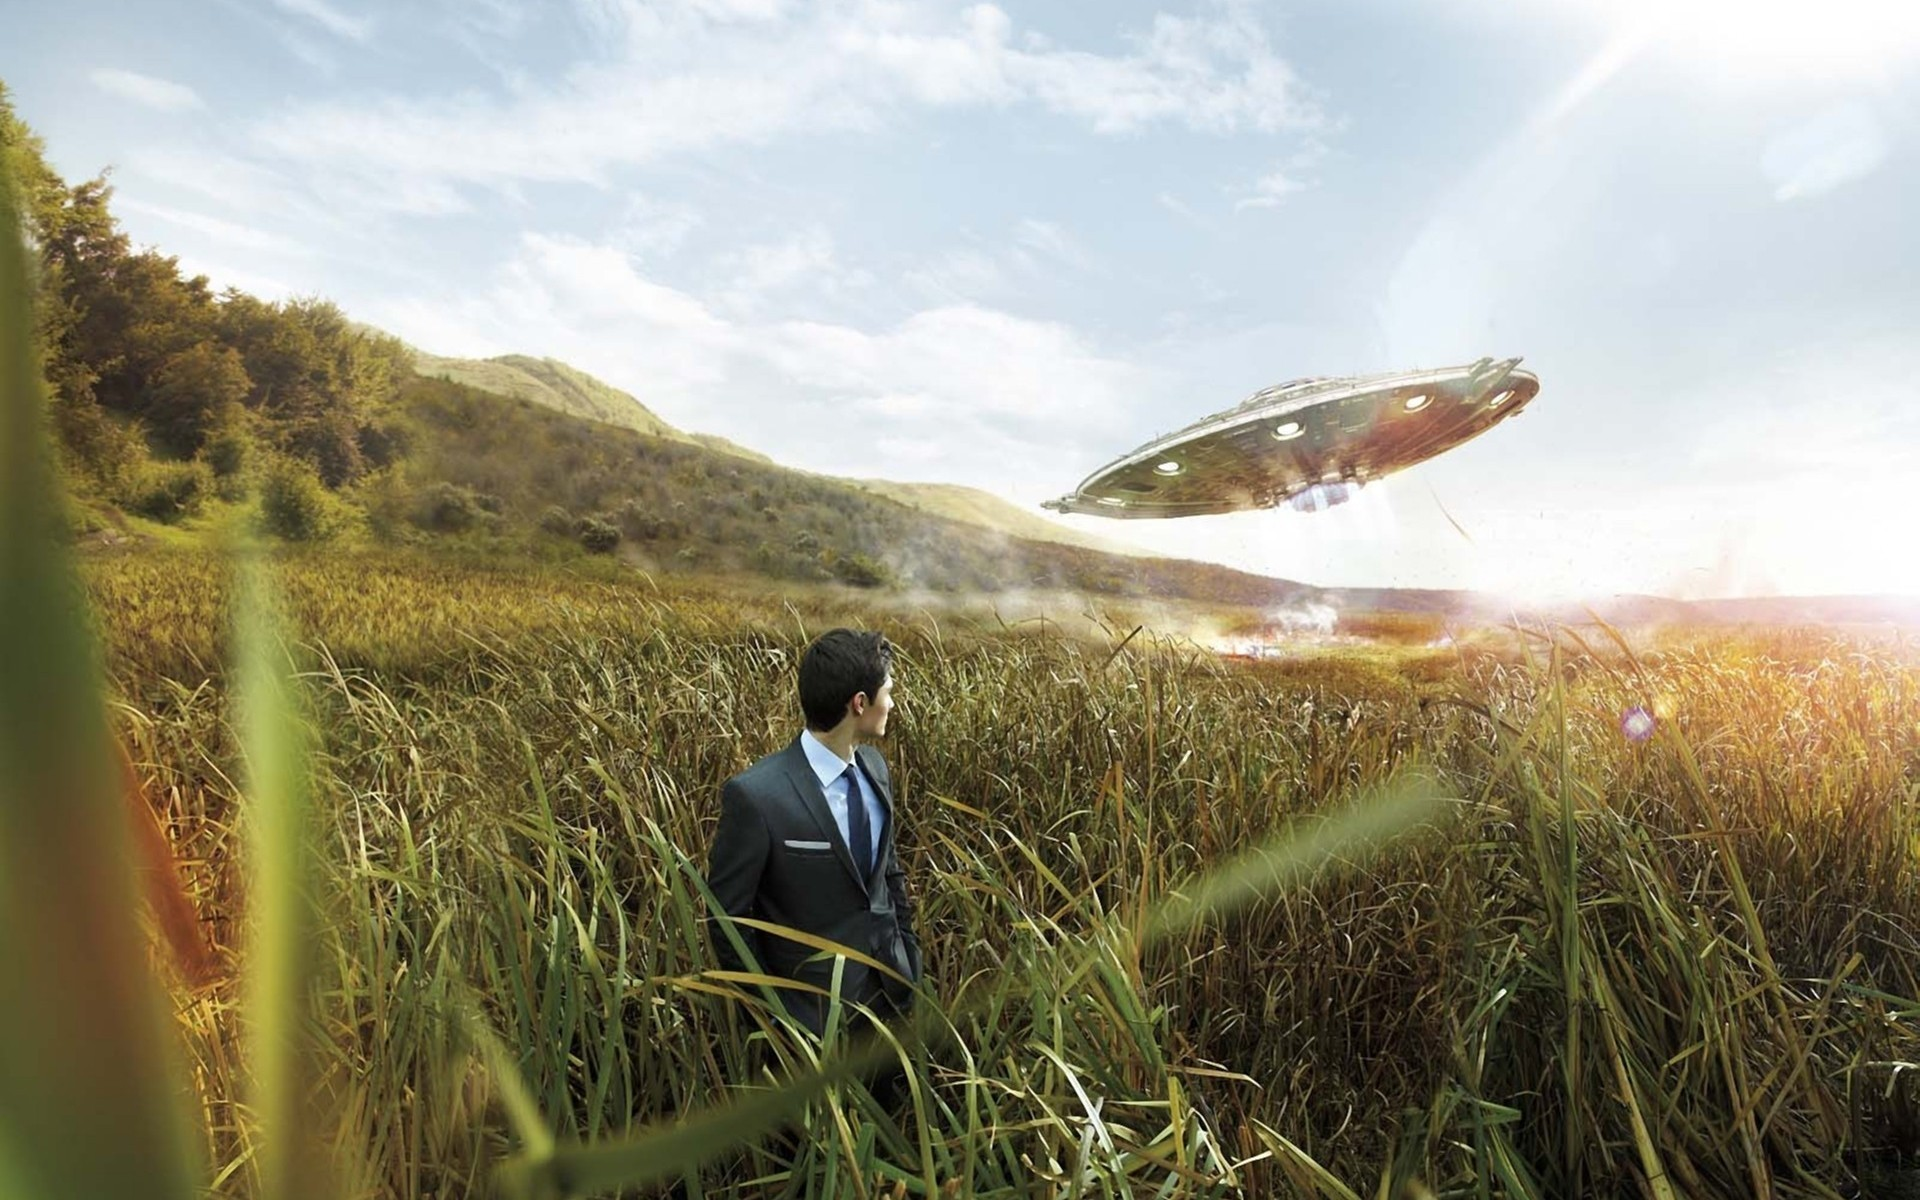 Morar Gheorghita man field grass ufo ship smoke landscapes spaceship  spacecraft situation flight sky clouds aliens wallpaper | | 55886  | …